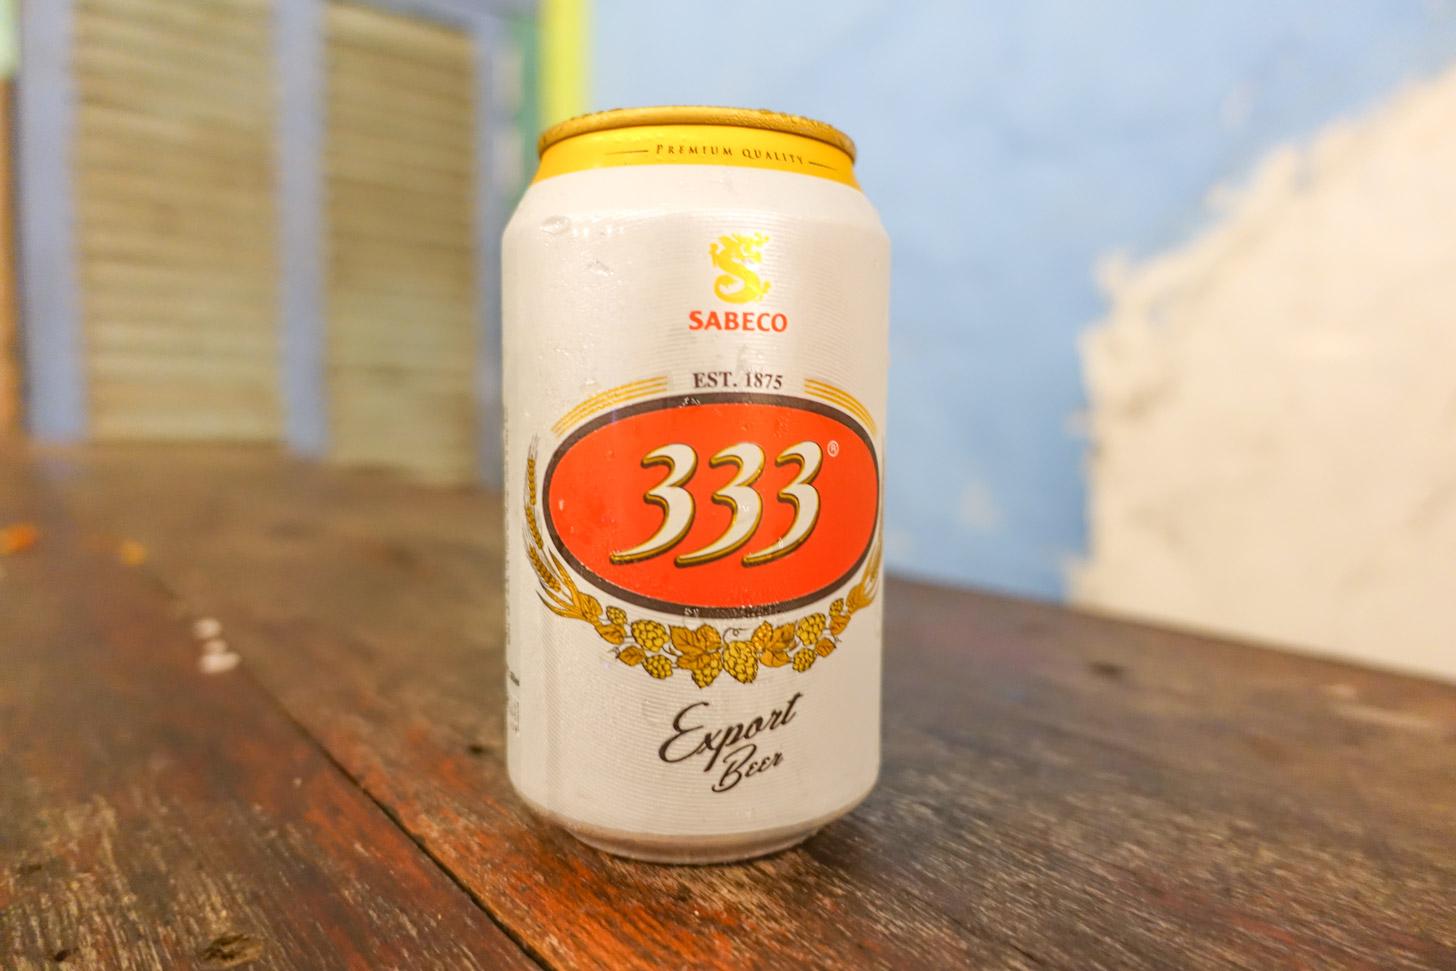 333 bier